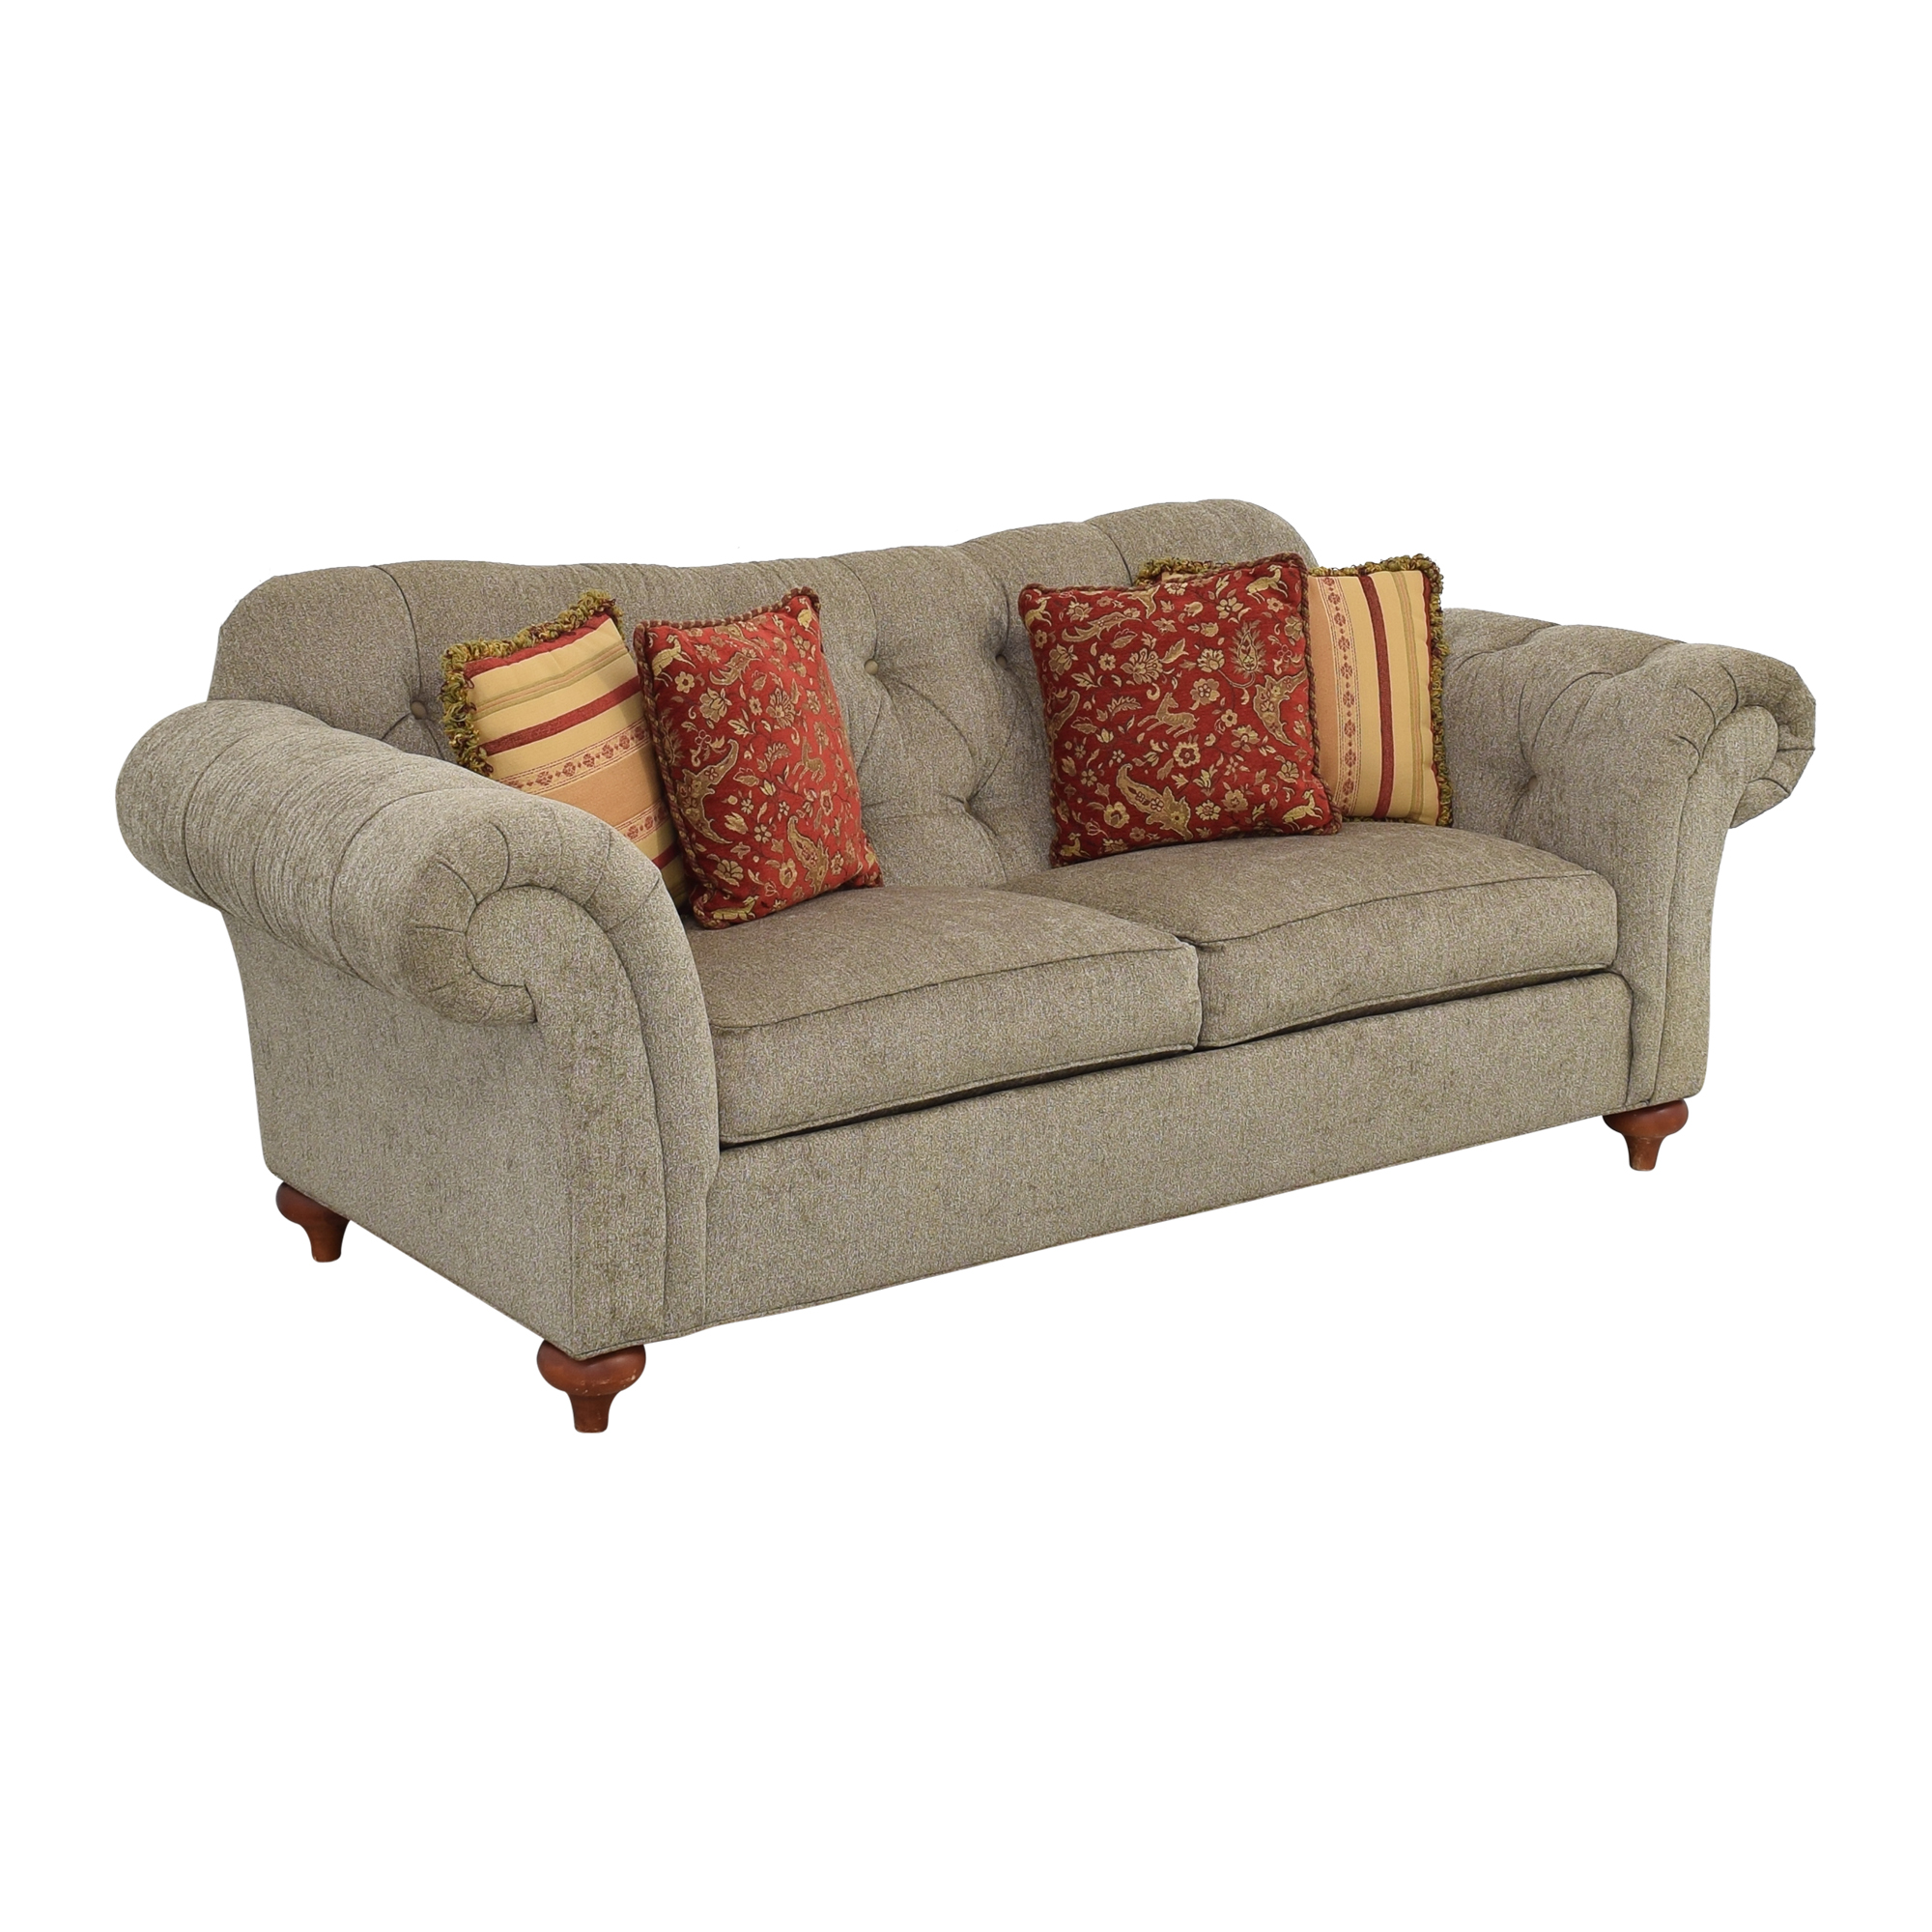 buy Ethan Allen Ethan Allen Two Cushion Sofa online